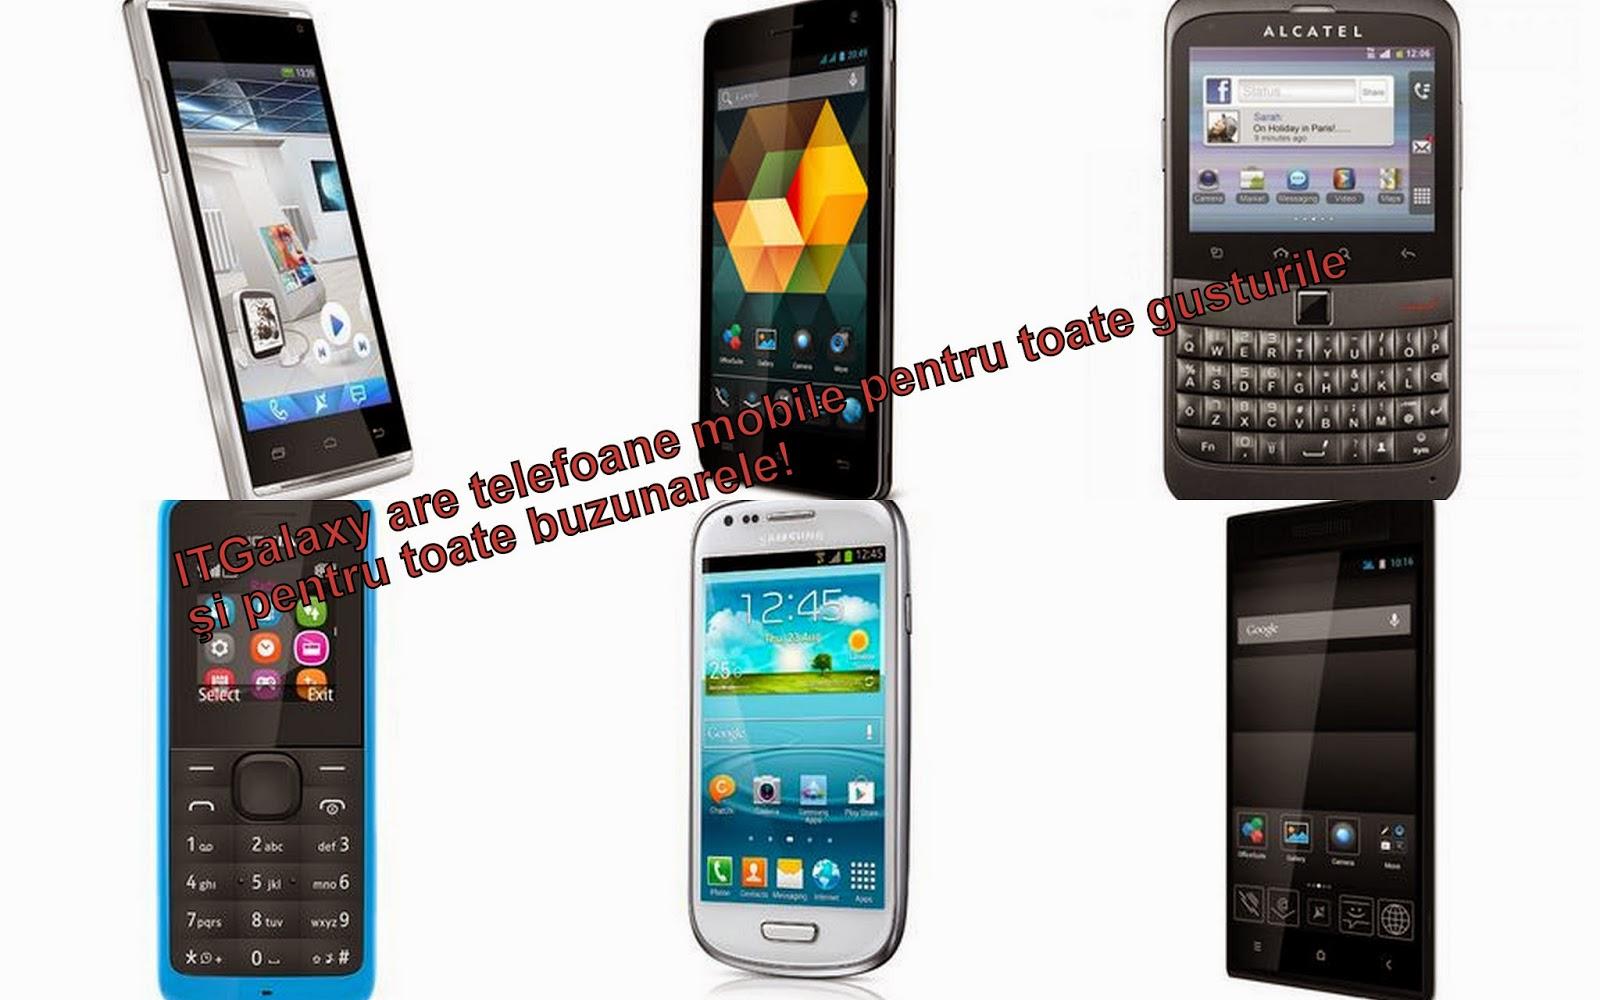 http://www.itgalaxy.ro/telefoane-mobile/